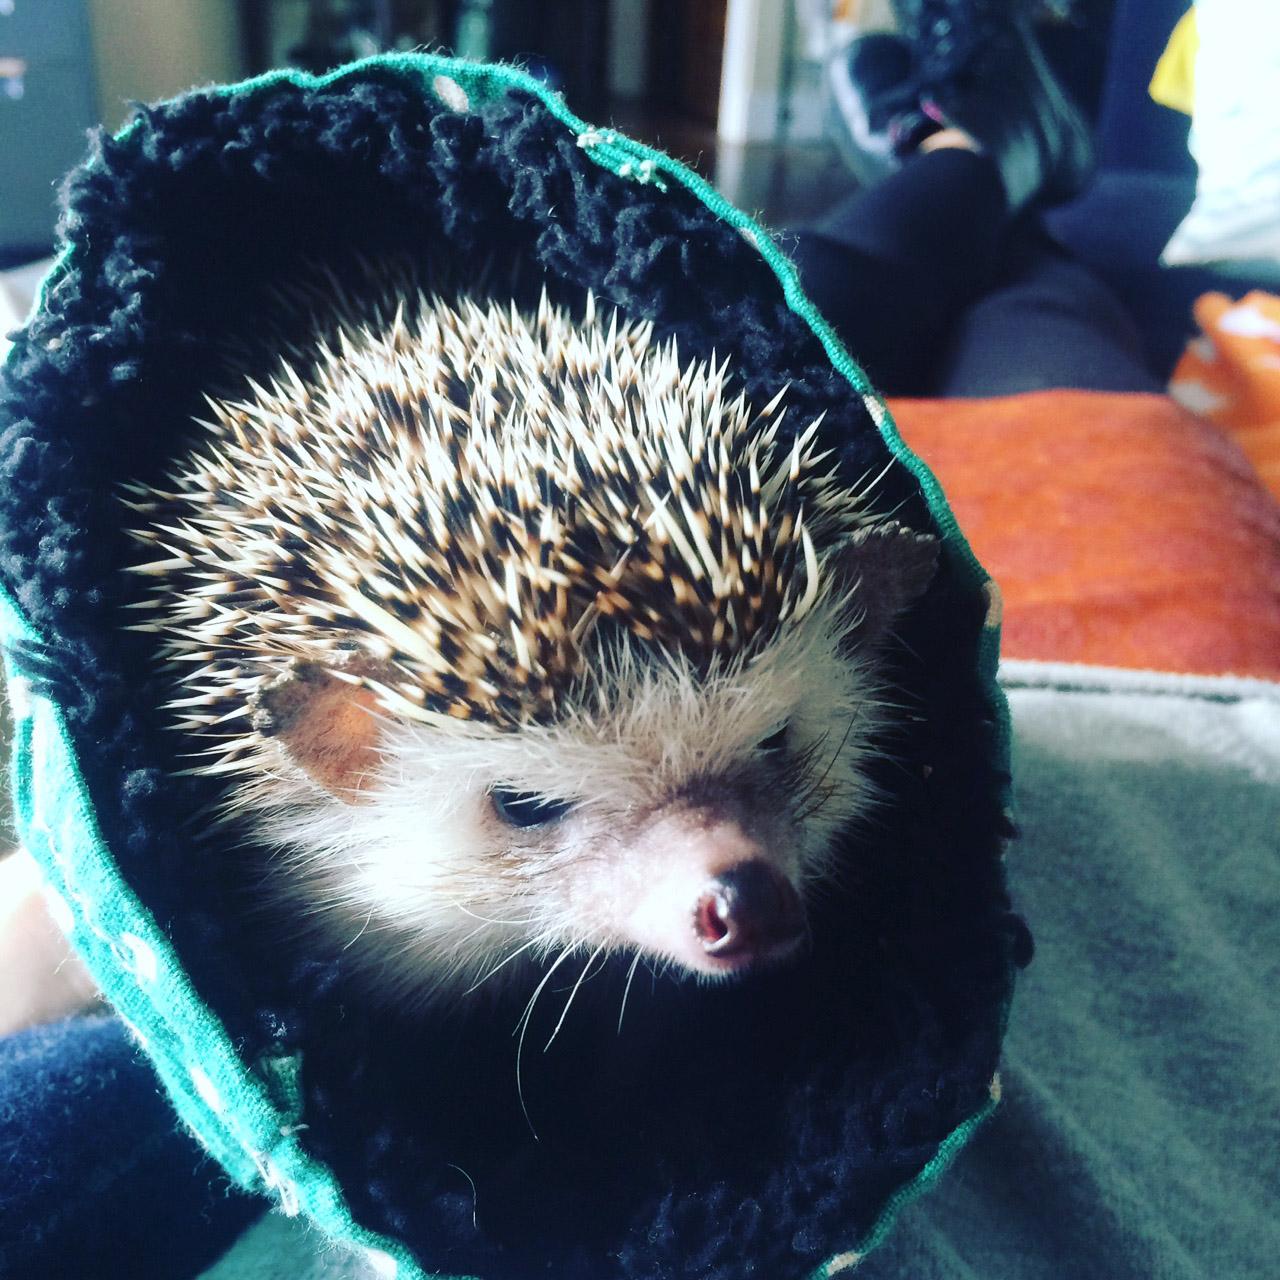 Frenchy the Hedgehog. Photo courtesy of Daniel Ash.